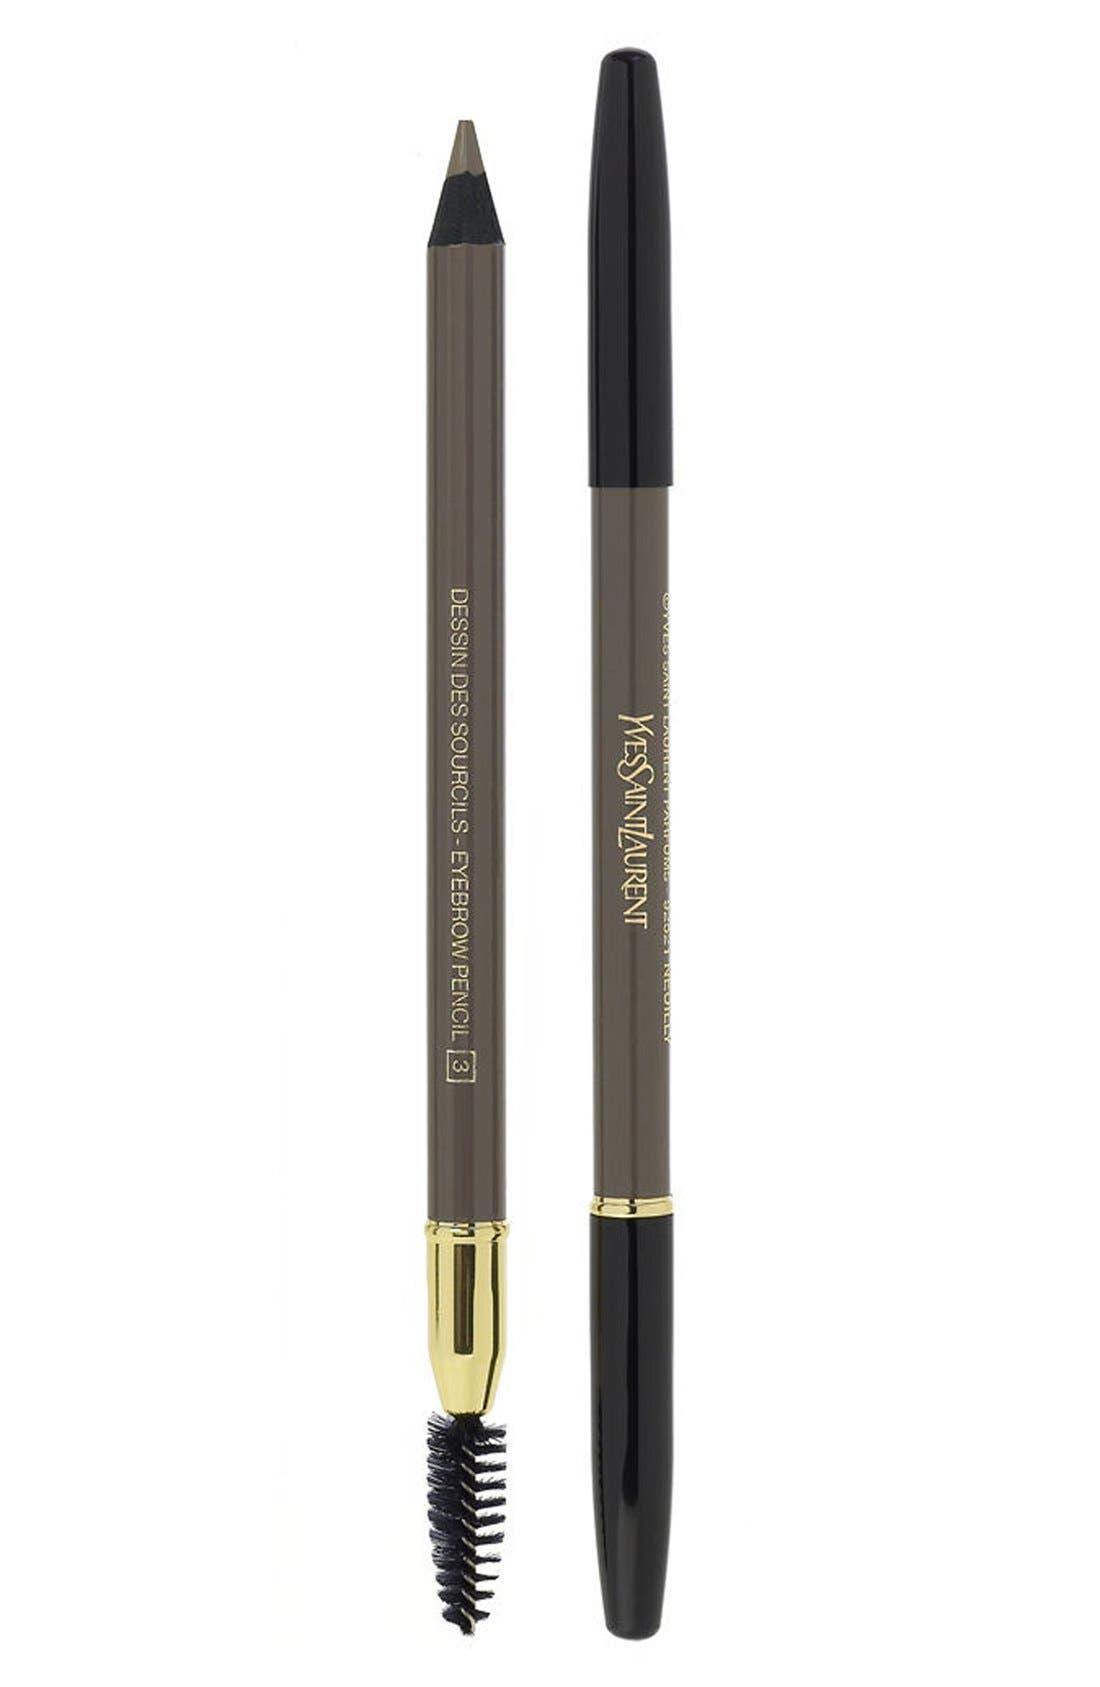 Yves Saint Laurent Eyebrow Pencil